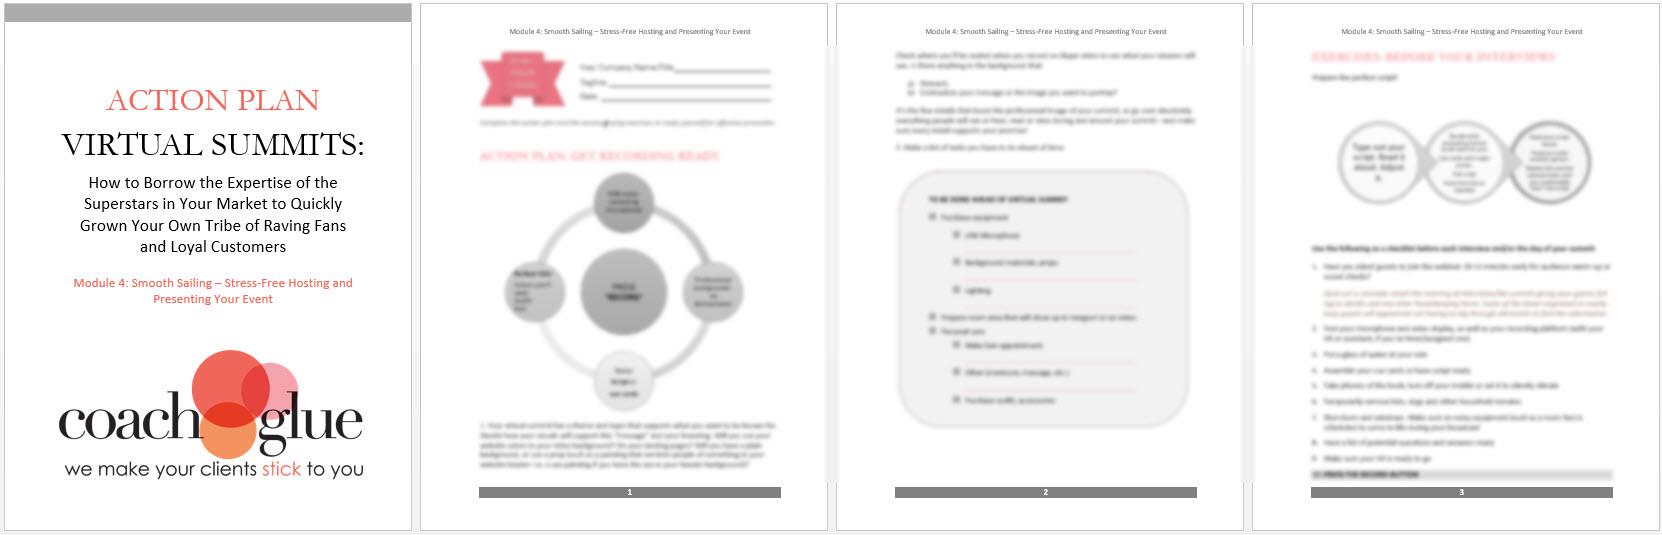 module 4 action plan